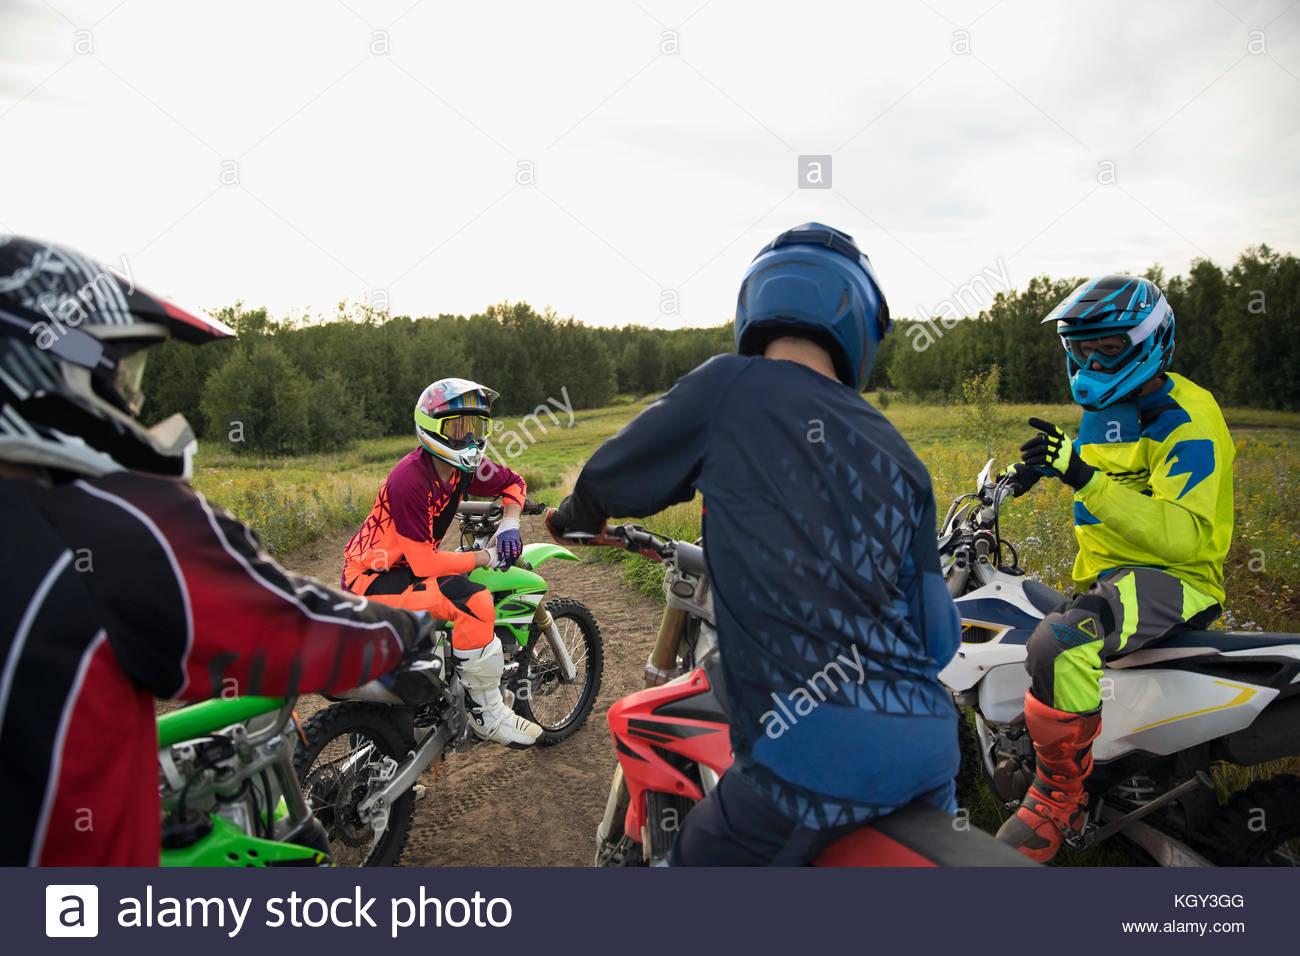 Male friends on motorbikes talking - Stock Image